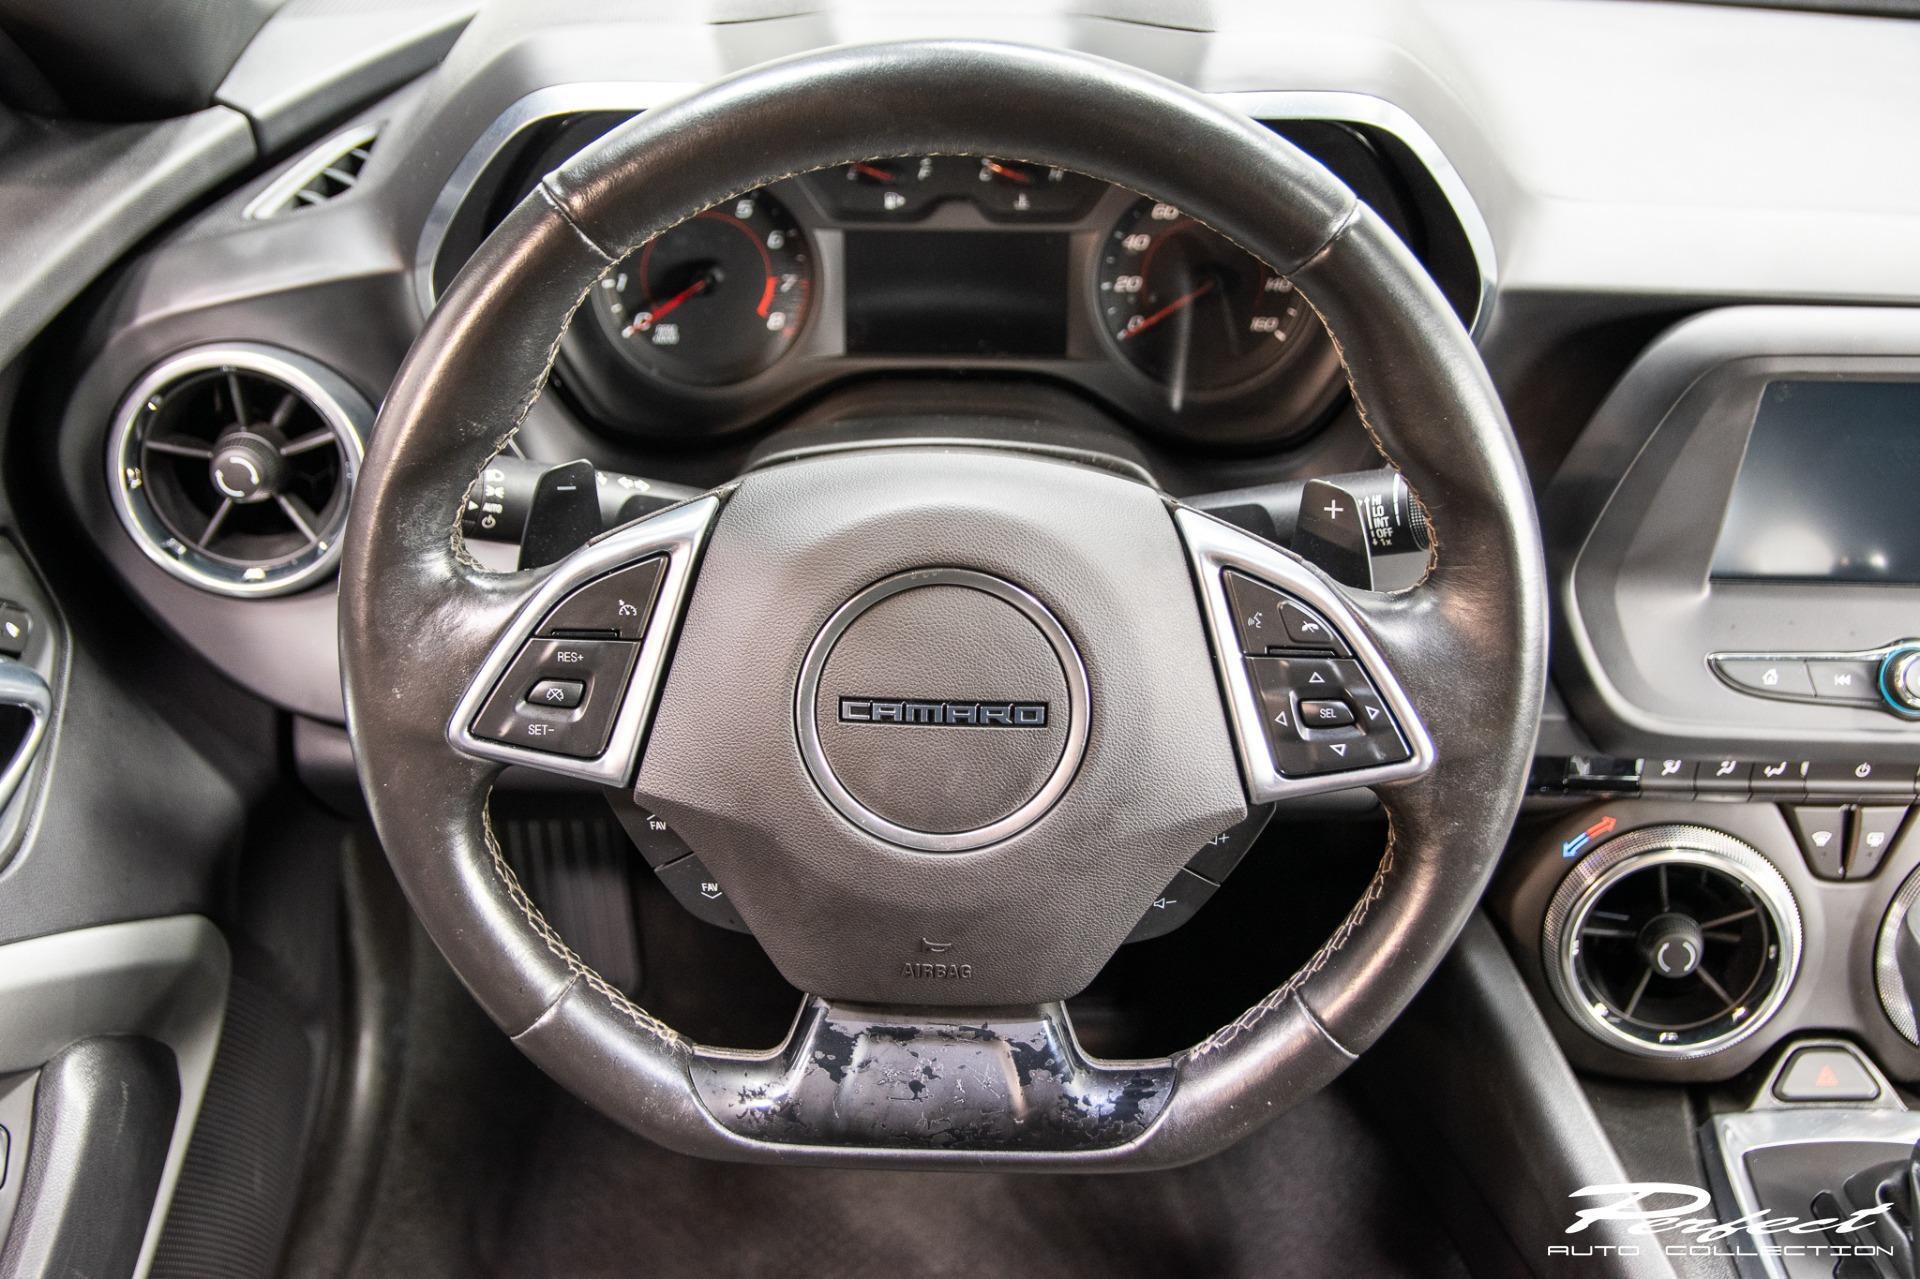 Used 2016 Chevrolet Camaro LT